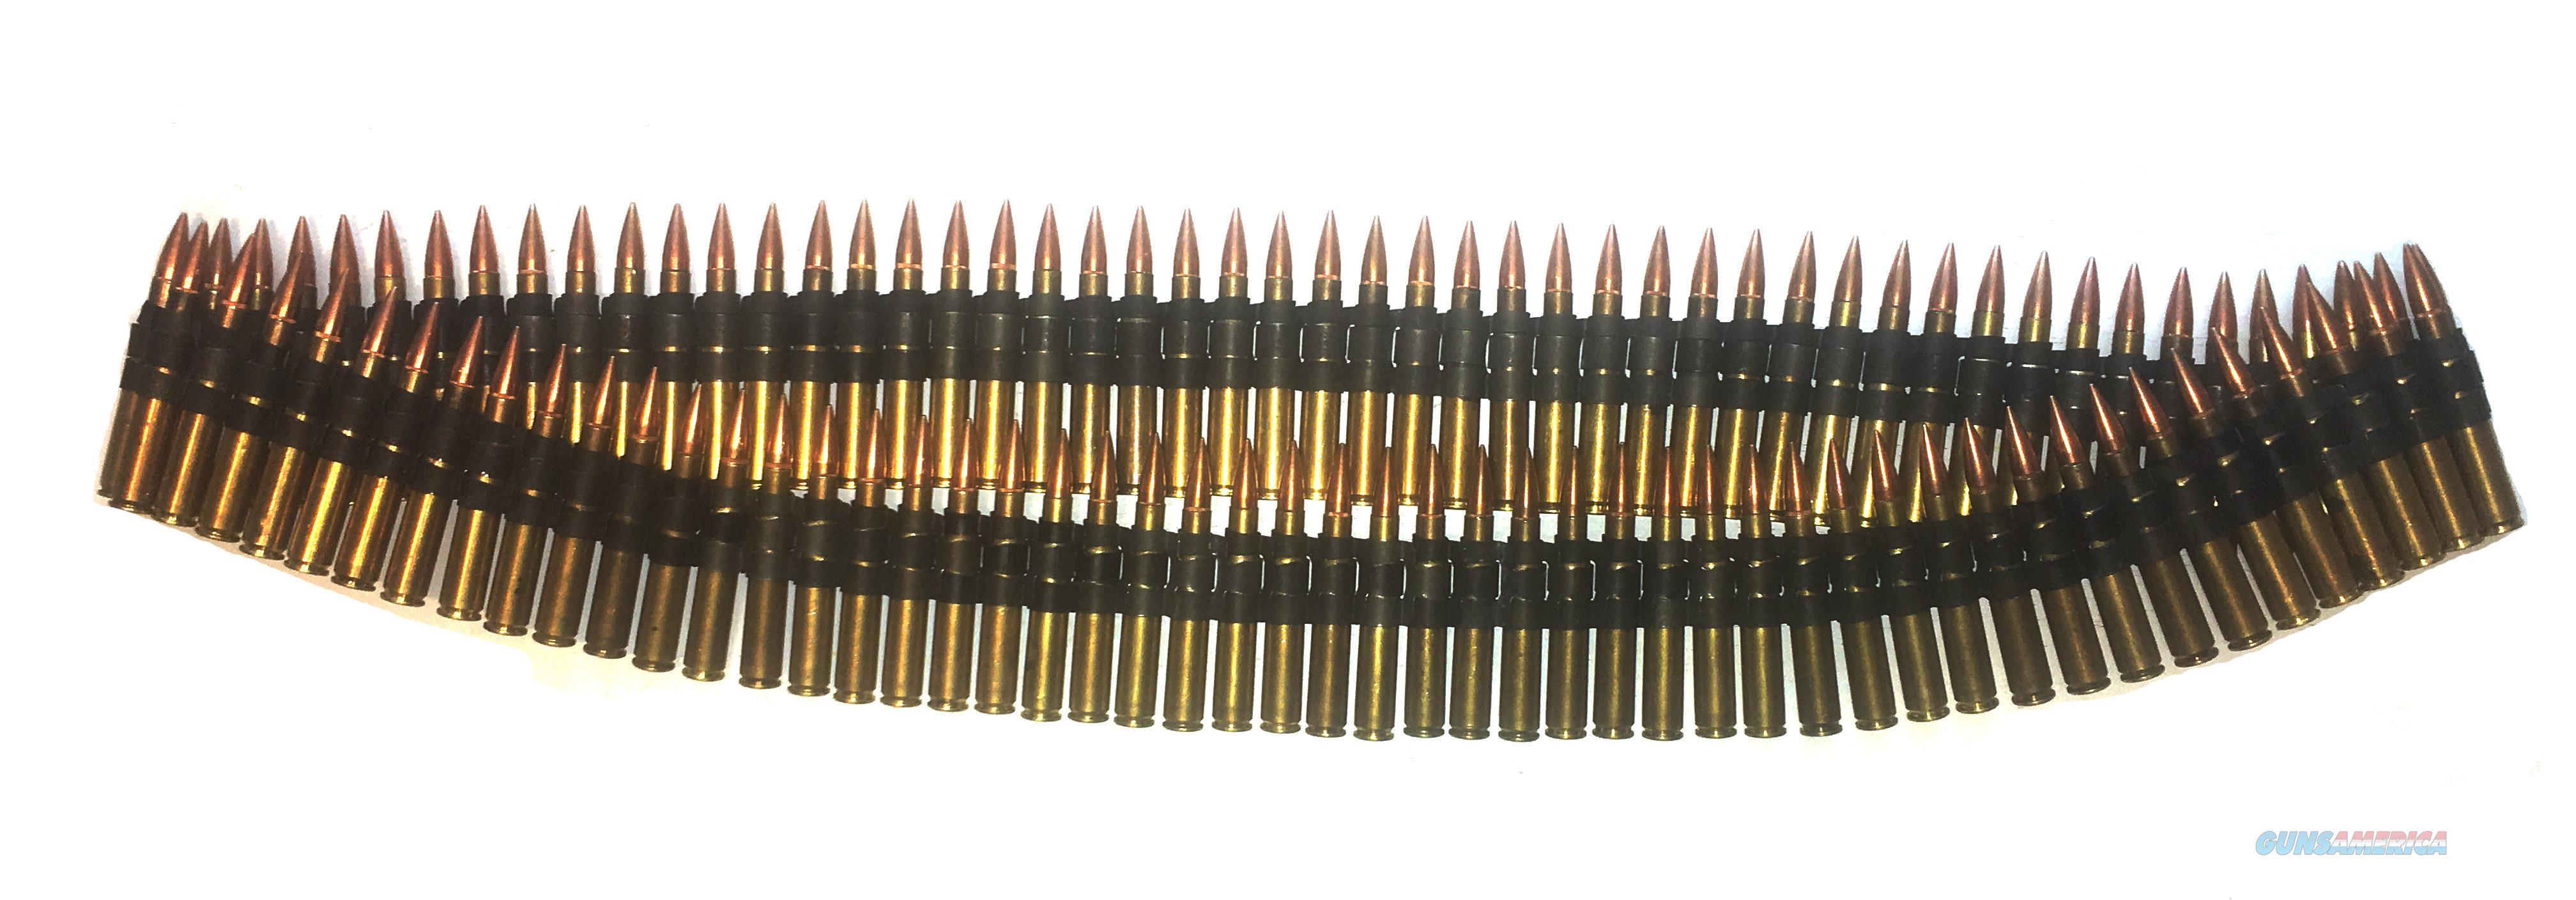 100rd Belt 30-06 Dummy Round Browning 1919 Links WWII  Non-Guns > Ammunition